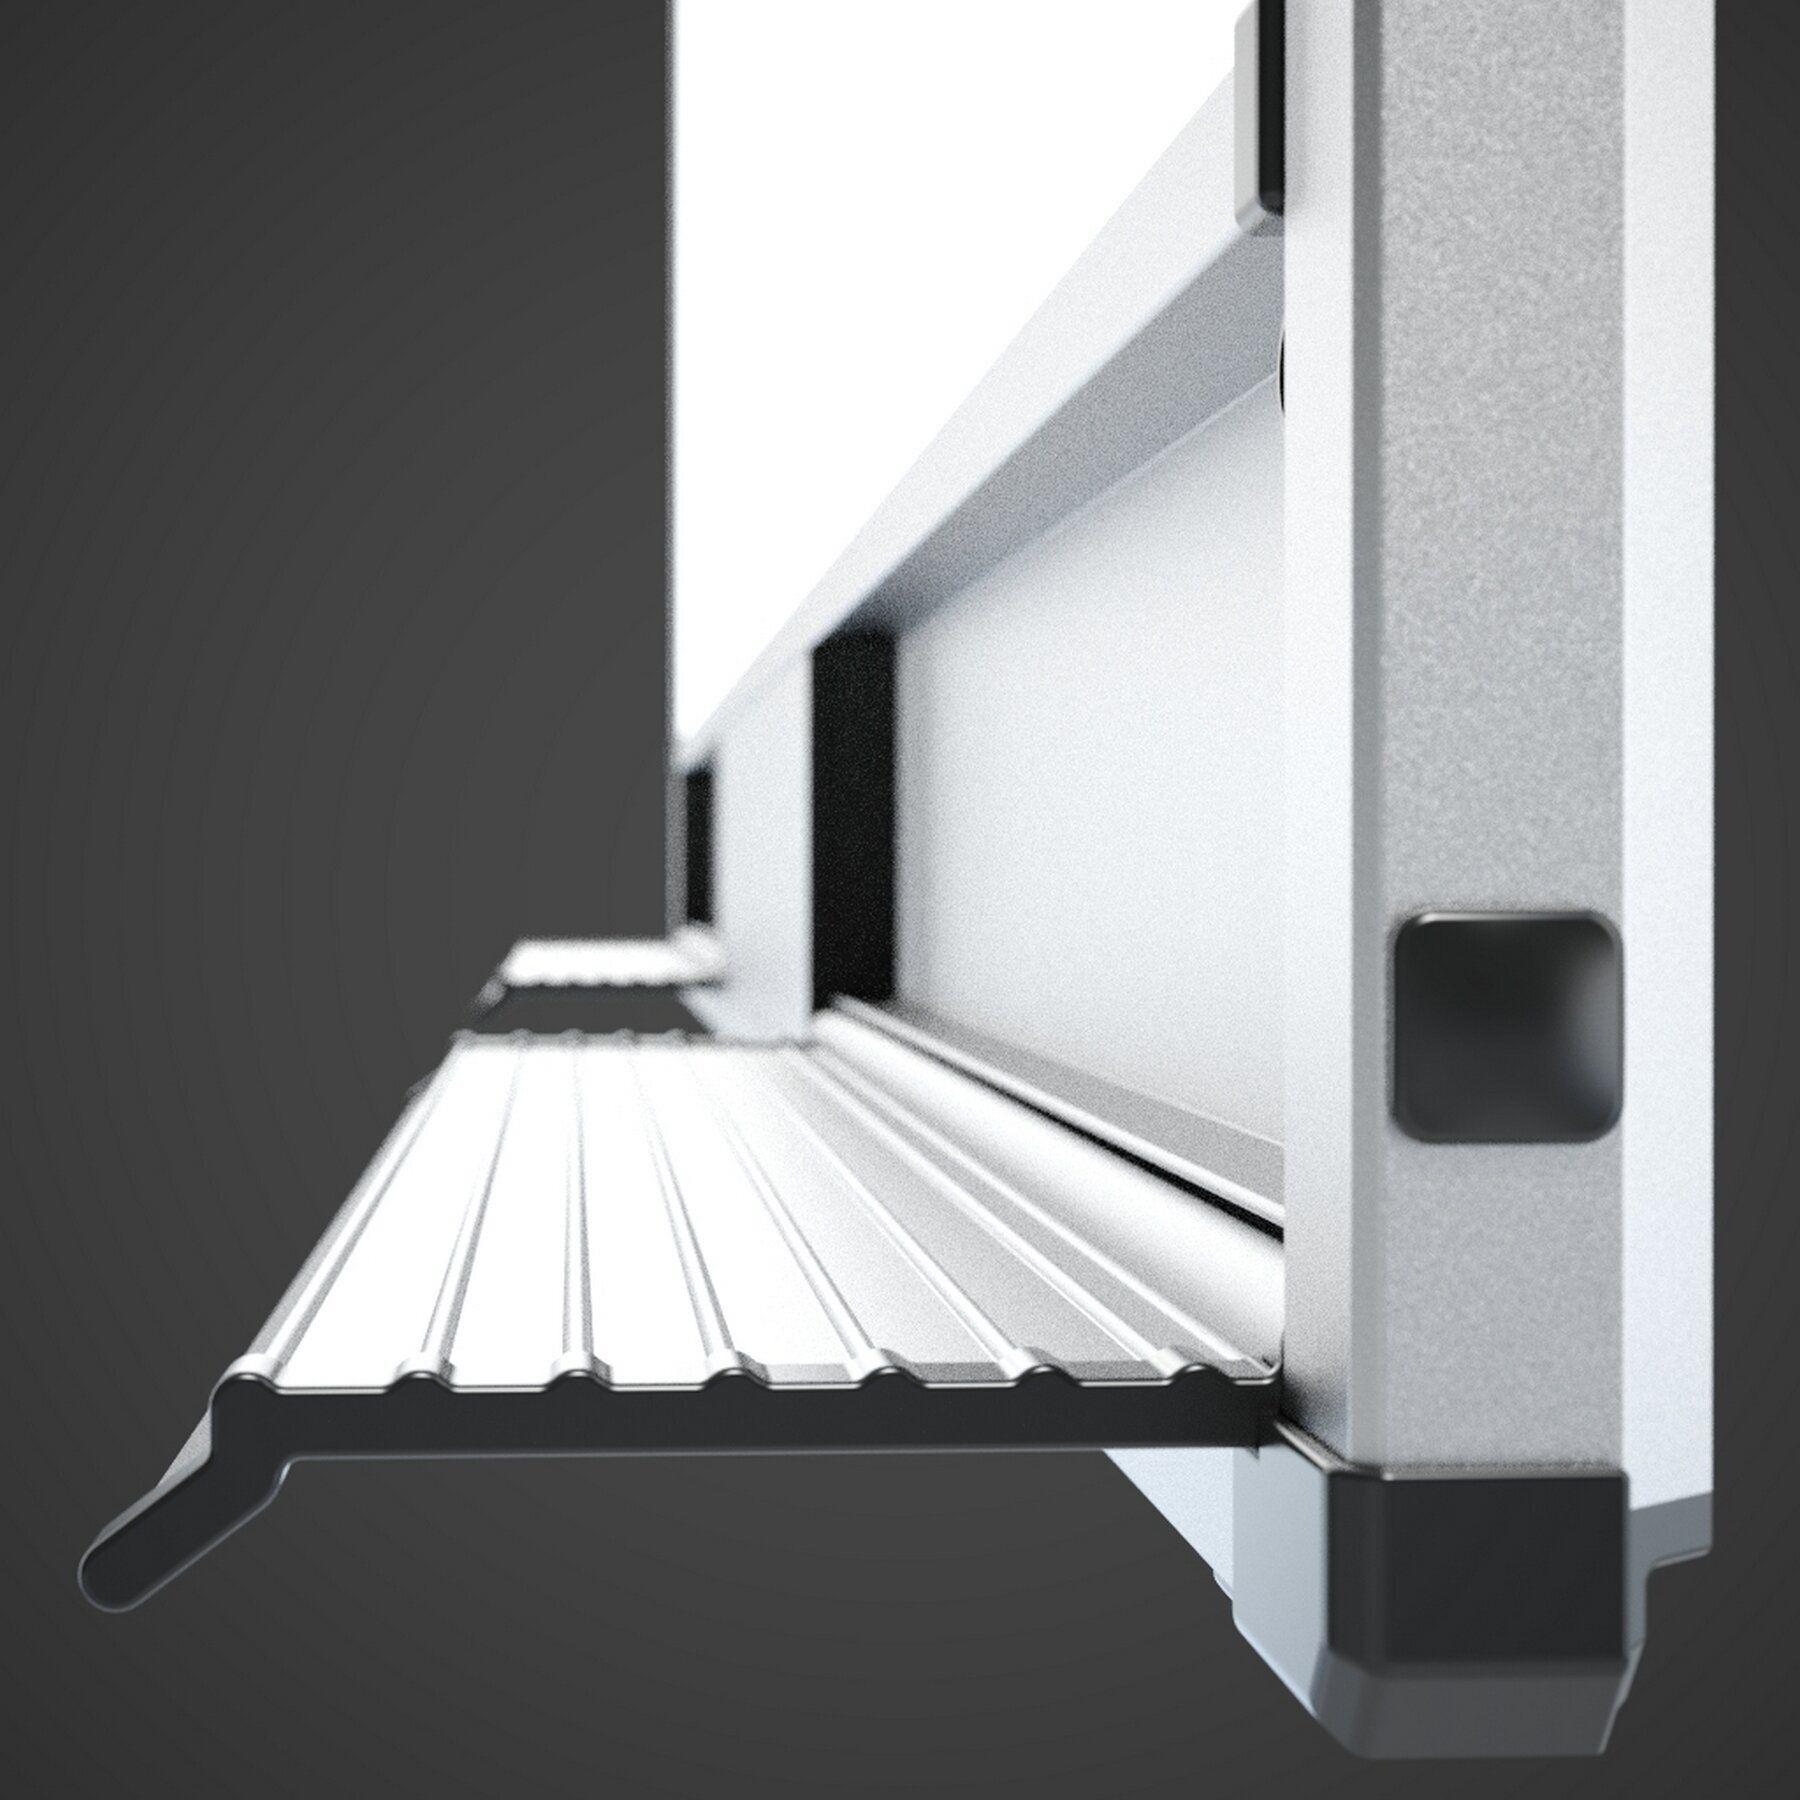 Доска белая магнитная сухостираемая StarBoard 100*150см., алюминиевая рамка, керамика 2x3 - фото 6